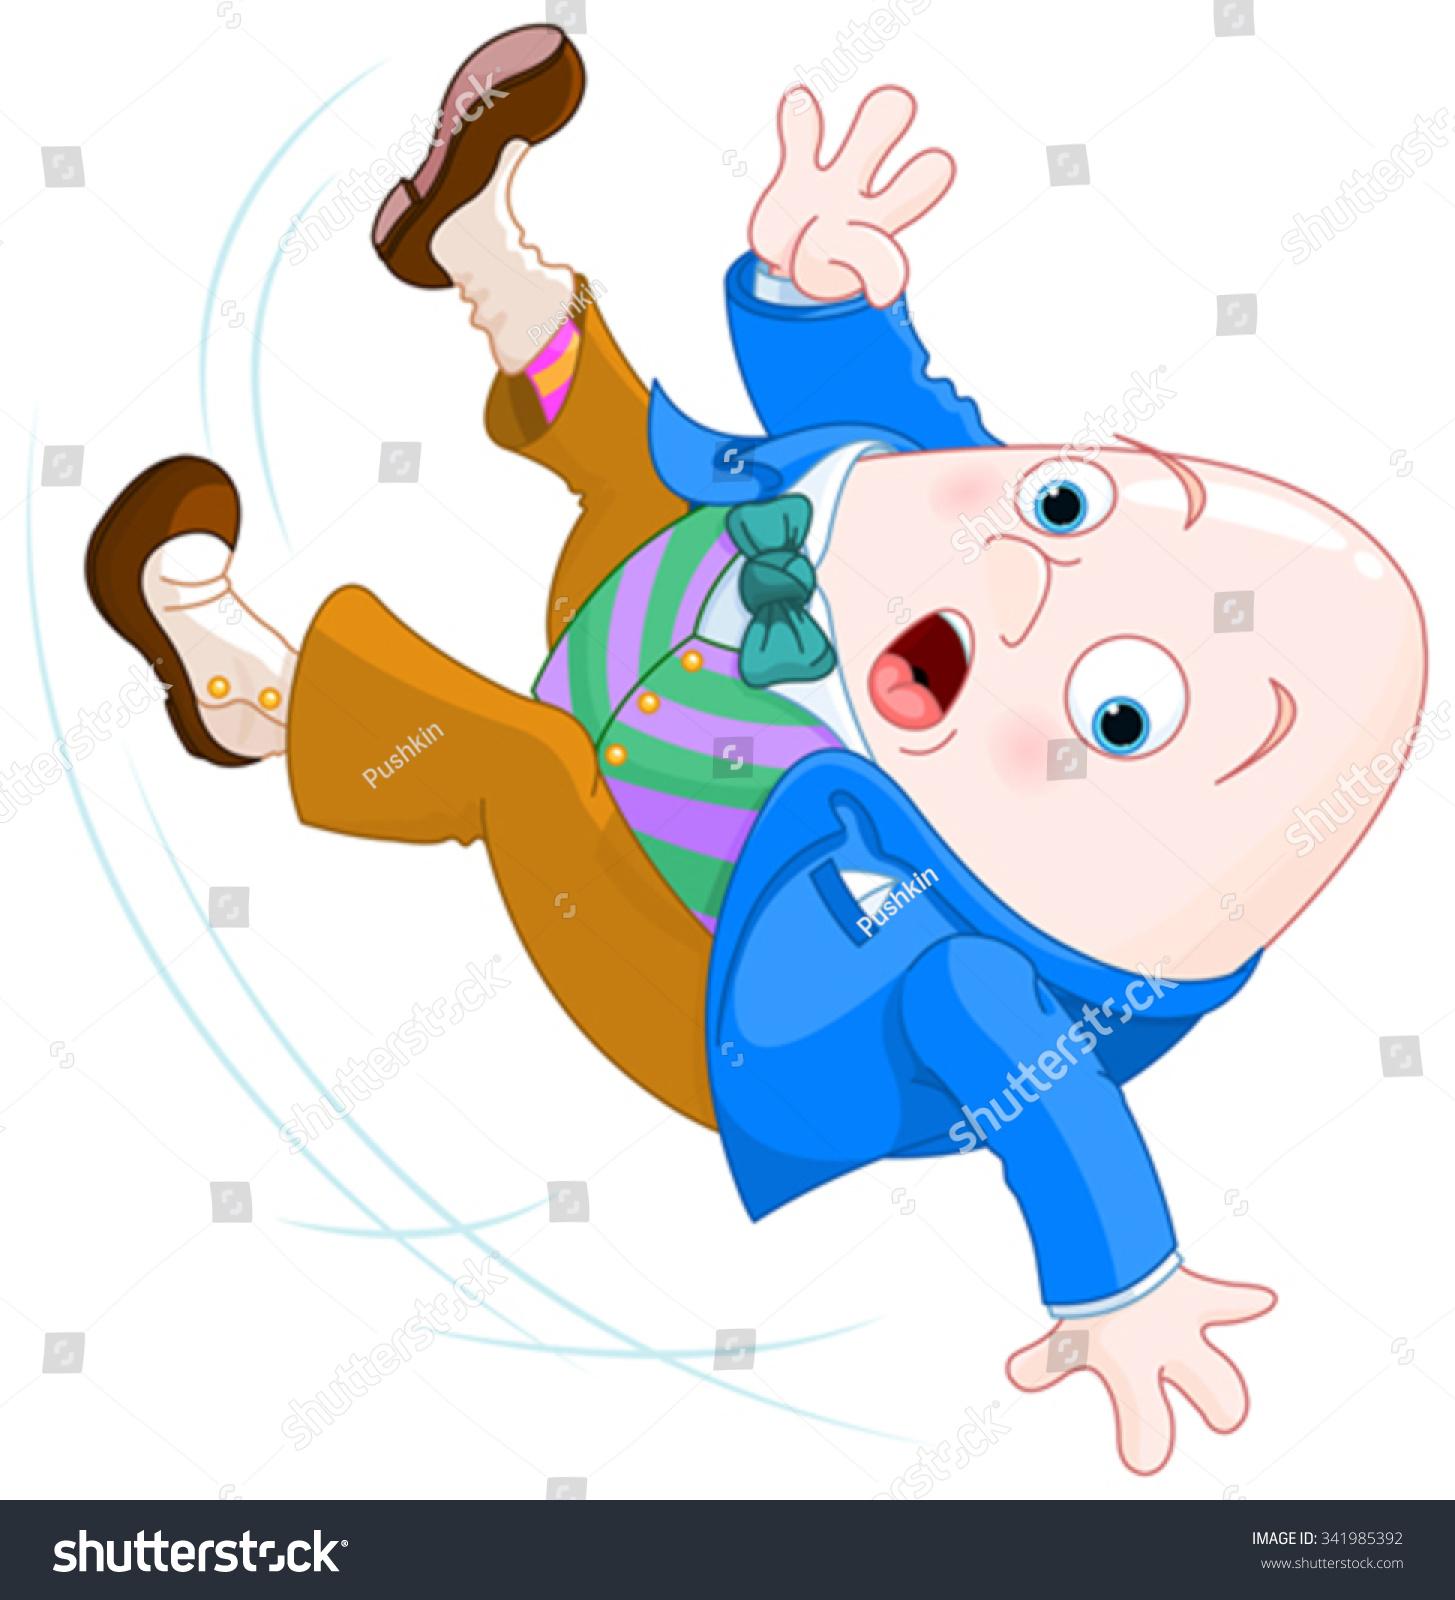 Humpty Dumpty Falls Down Stock Vector Royalty Free 341985392